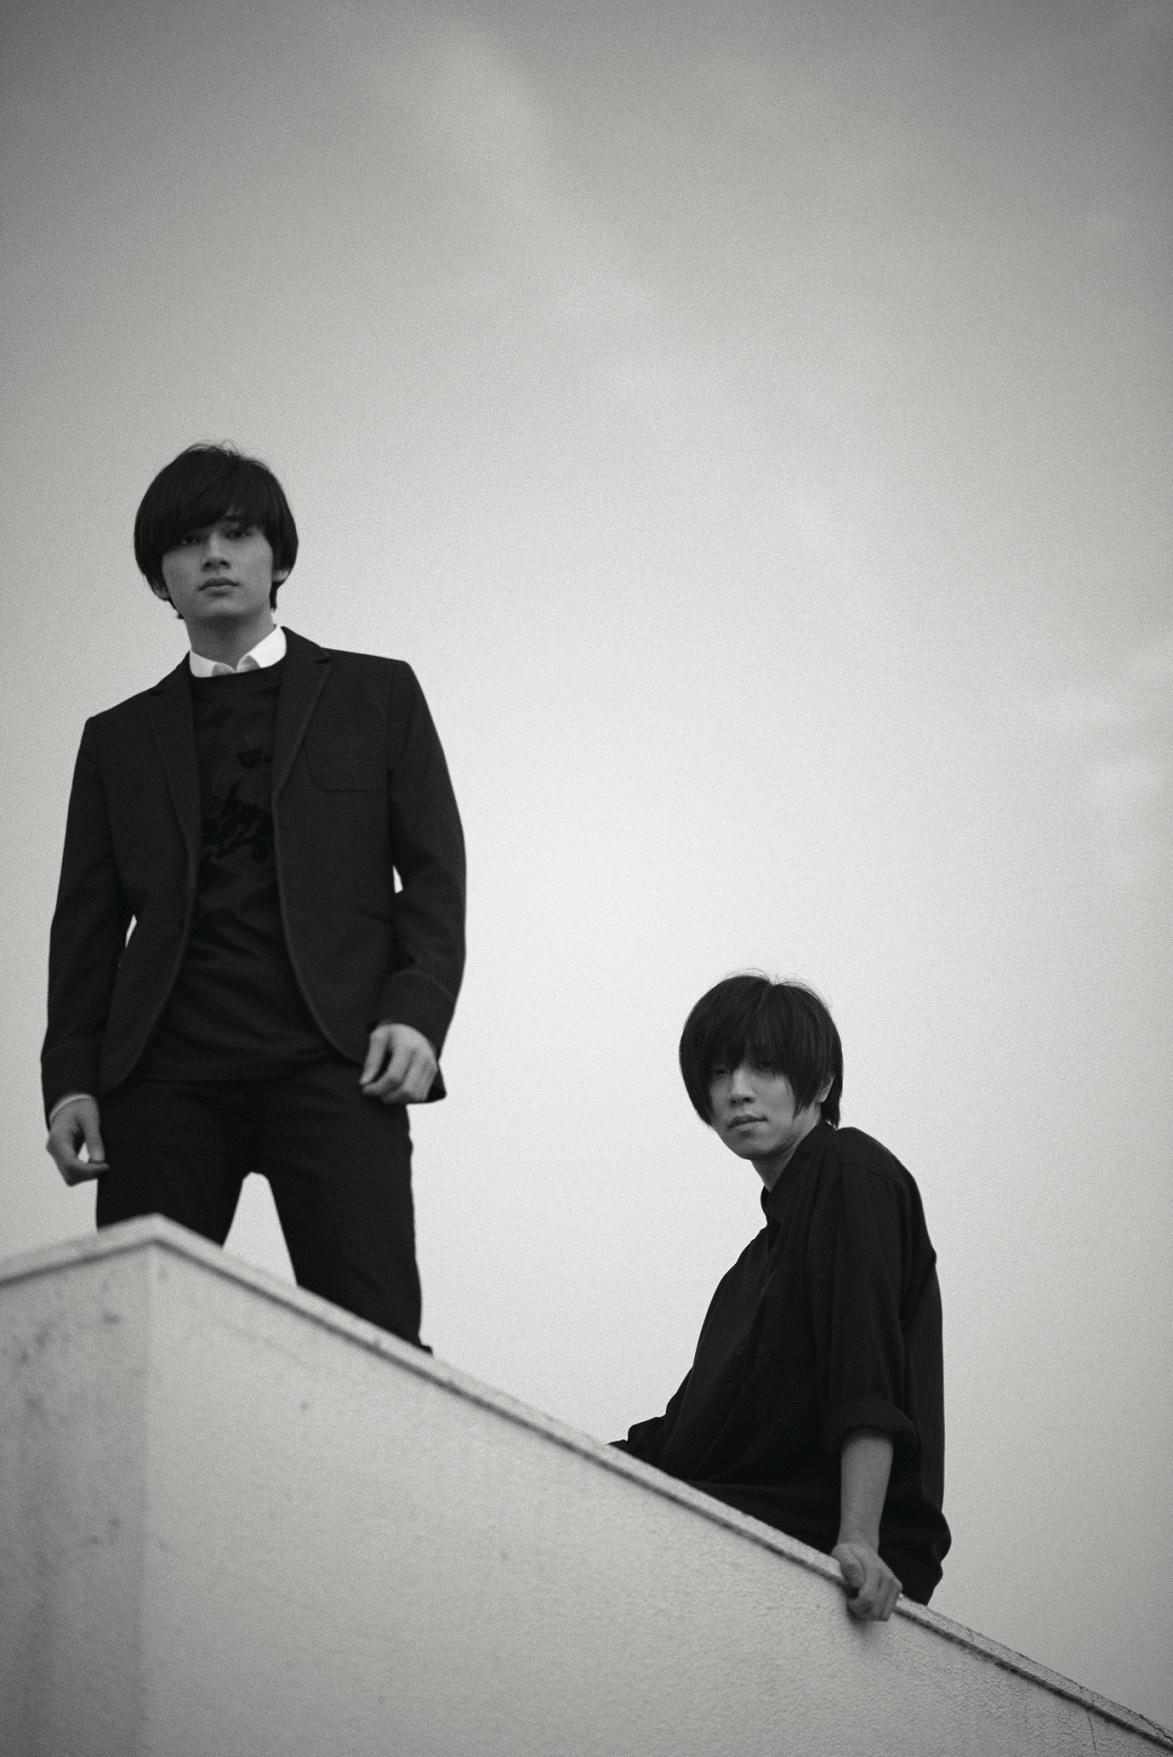 内澤崇仁(androp)、北村匠海(DISH//)